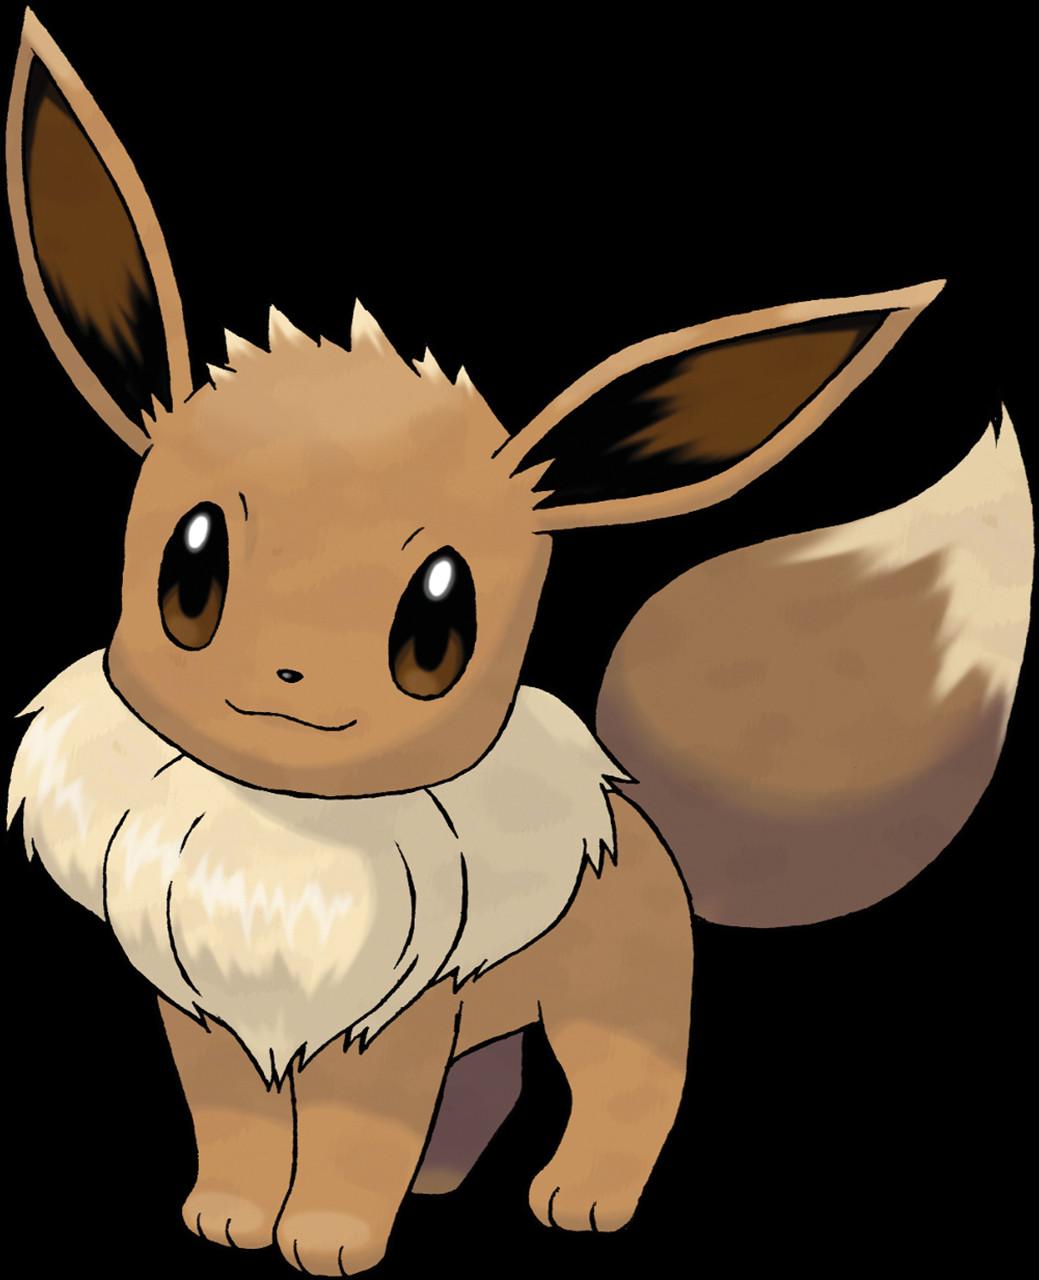 Ausmalbilder Pokemon Nachtara Genial Journey Y who are You Fotografieren